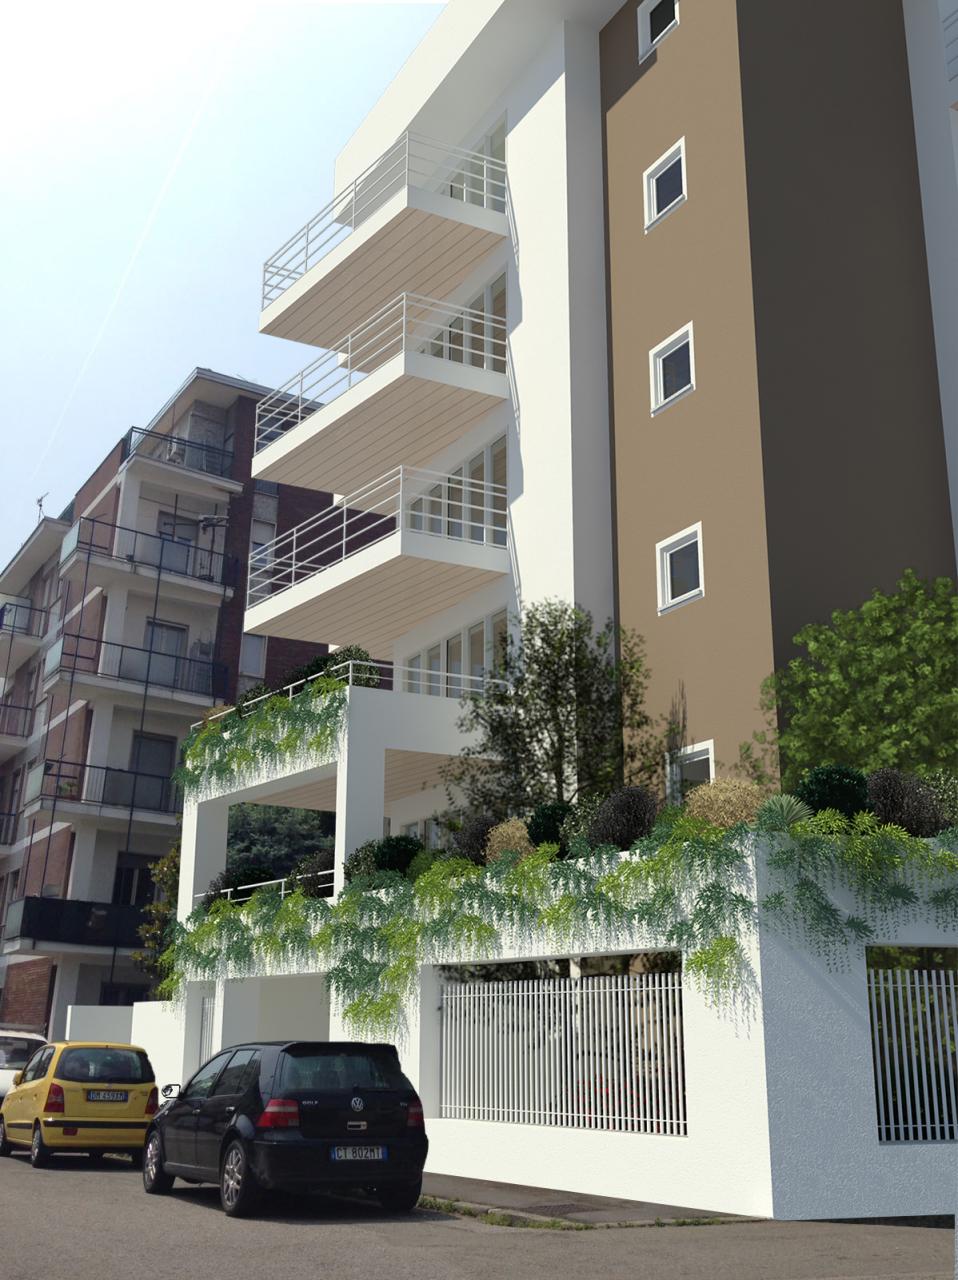 Appartamento in vendita a Novara, 2 locali, Trattative riservate   PortaleAgenzieImmobiliari.it